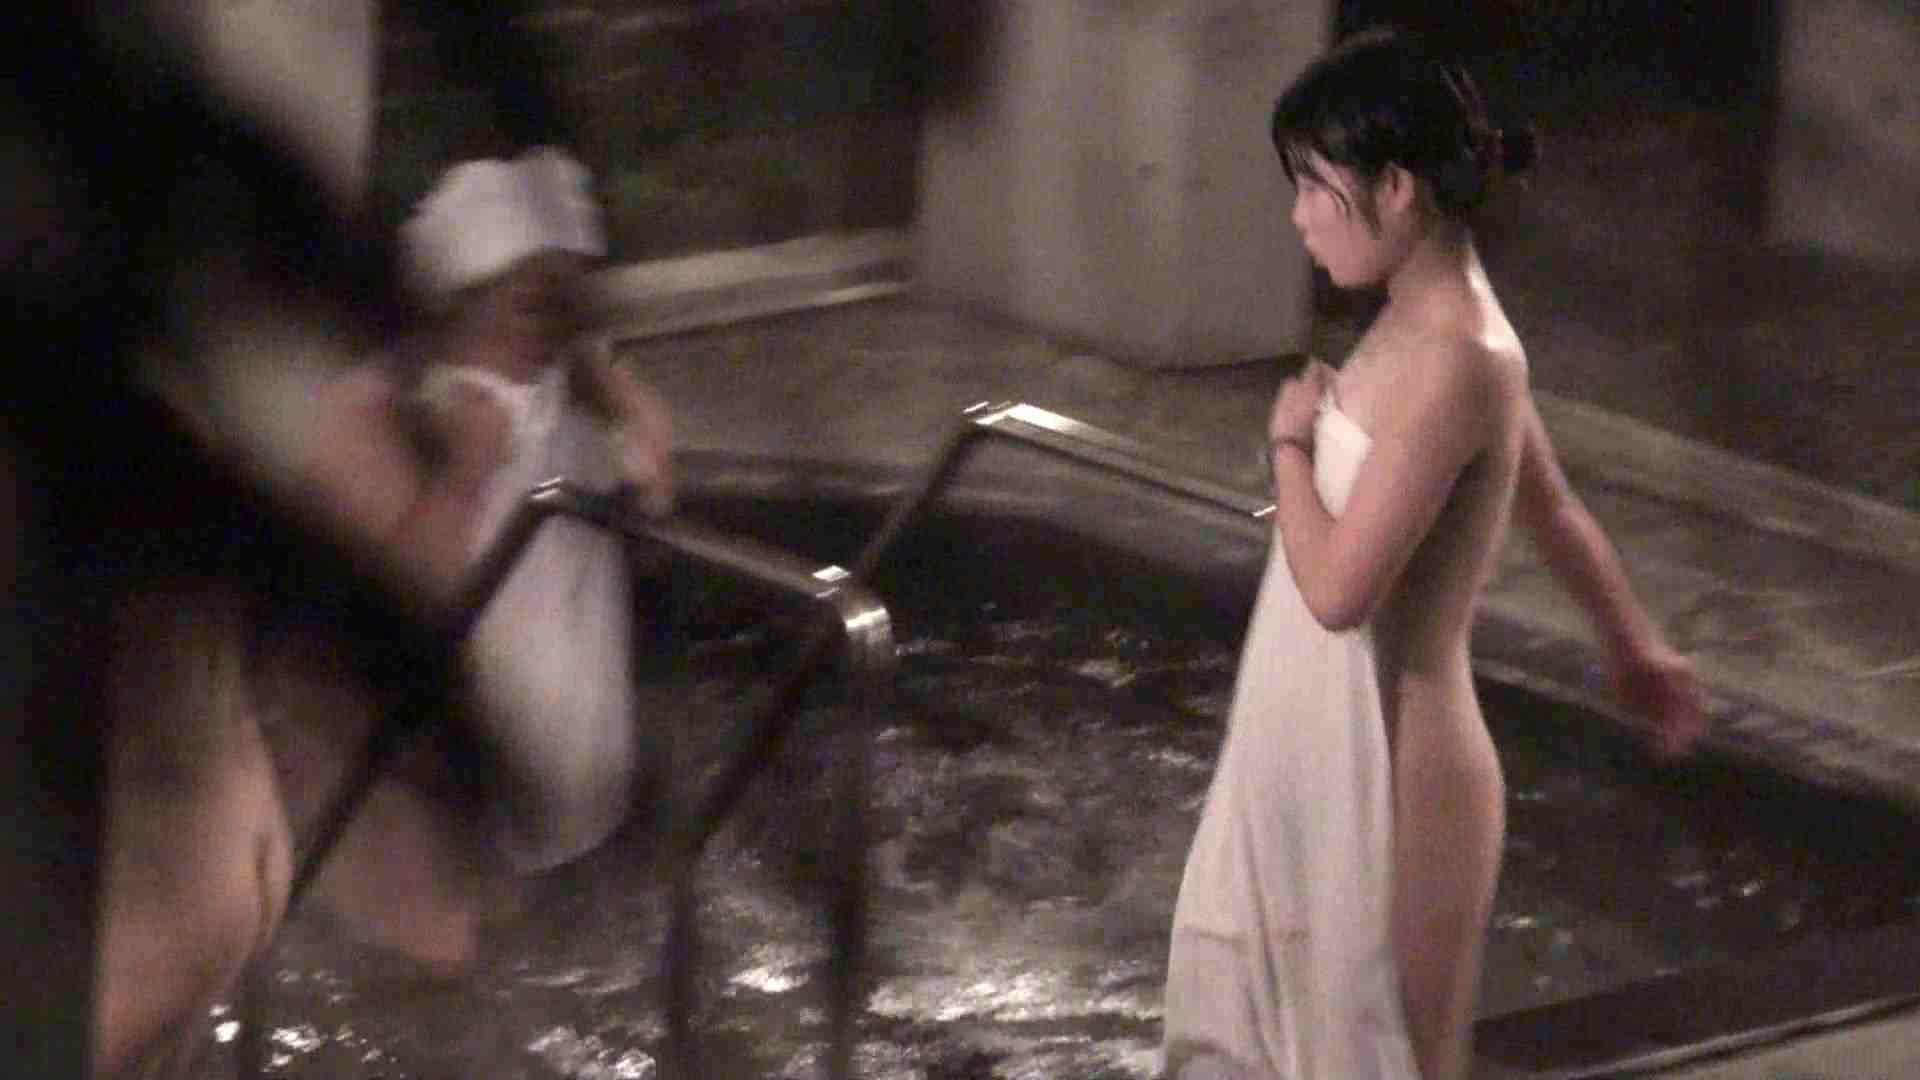 Aquaな露天風呂Vol.343 露天風呂 AV無料動画キャプチャ 92連発 2